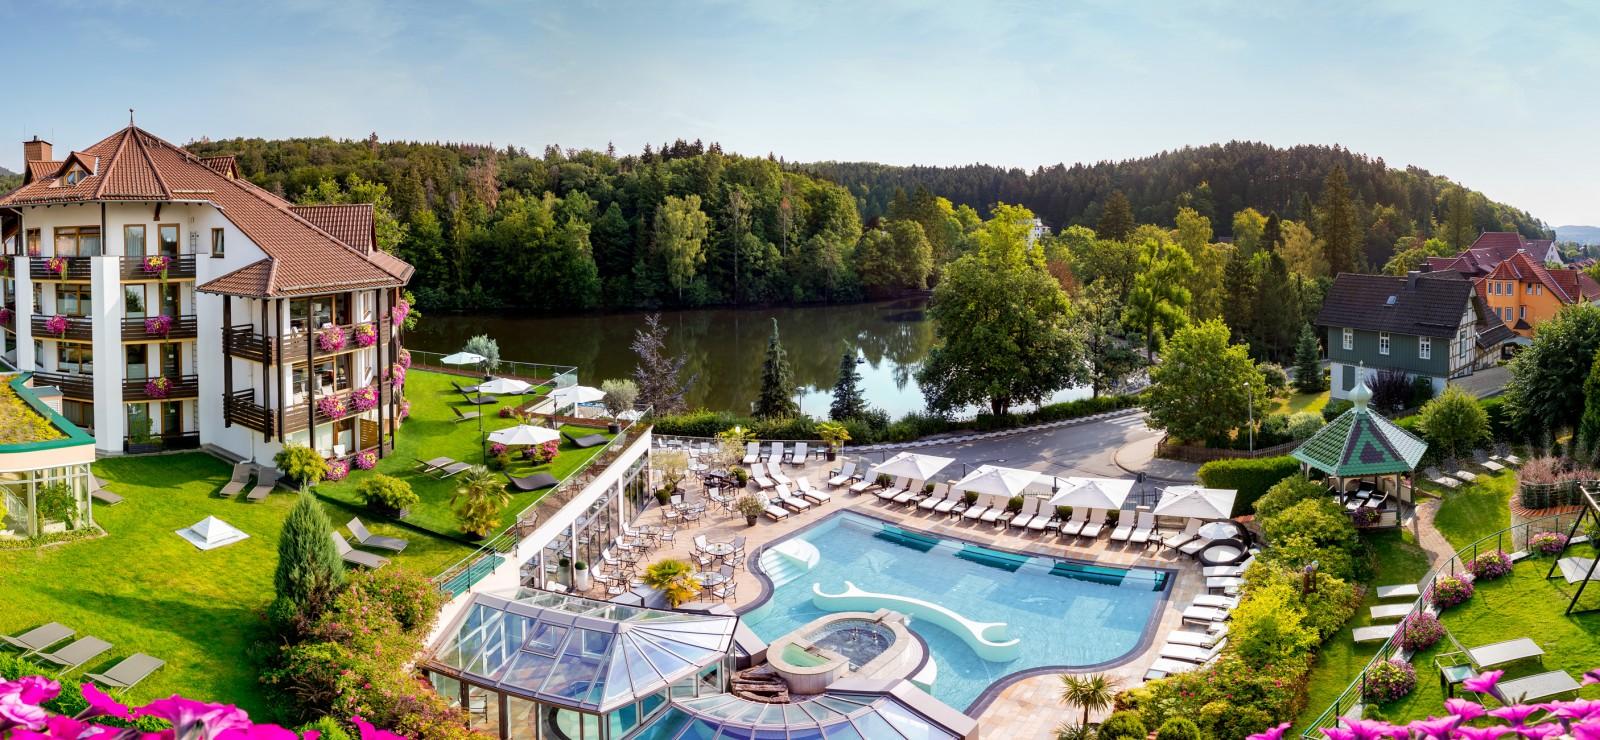 Full Size of Bad Lippspringe Hotel Wellnesshotels Einbeck Niedersachsen Besten Hotels Frankenhausen Barrierefreies Am Kurpark Lauterberg Juwel Füssing Zwischenahn Bad Bad Lippspringe Hotel